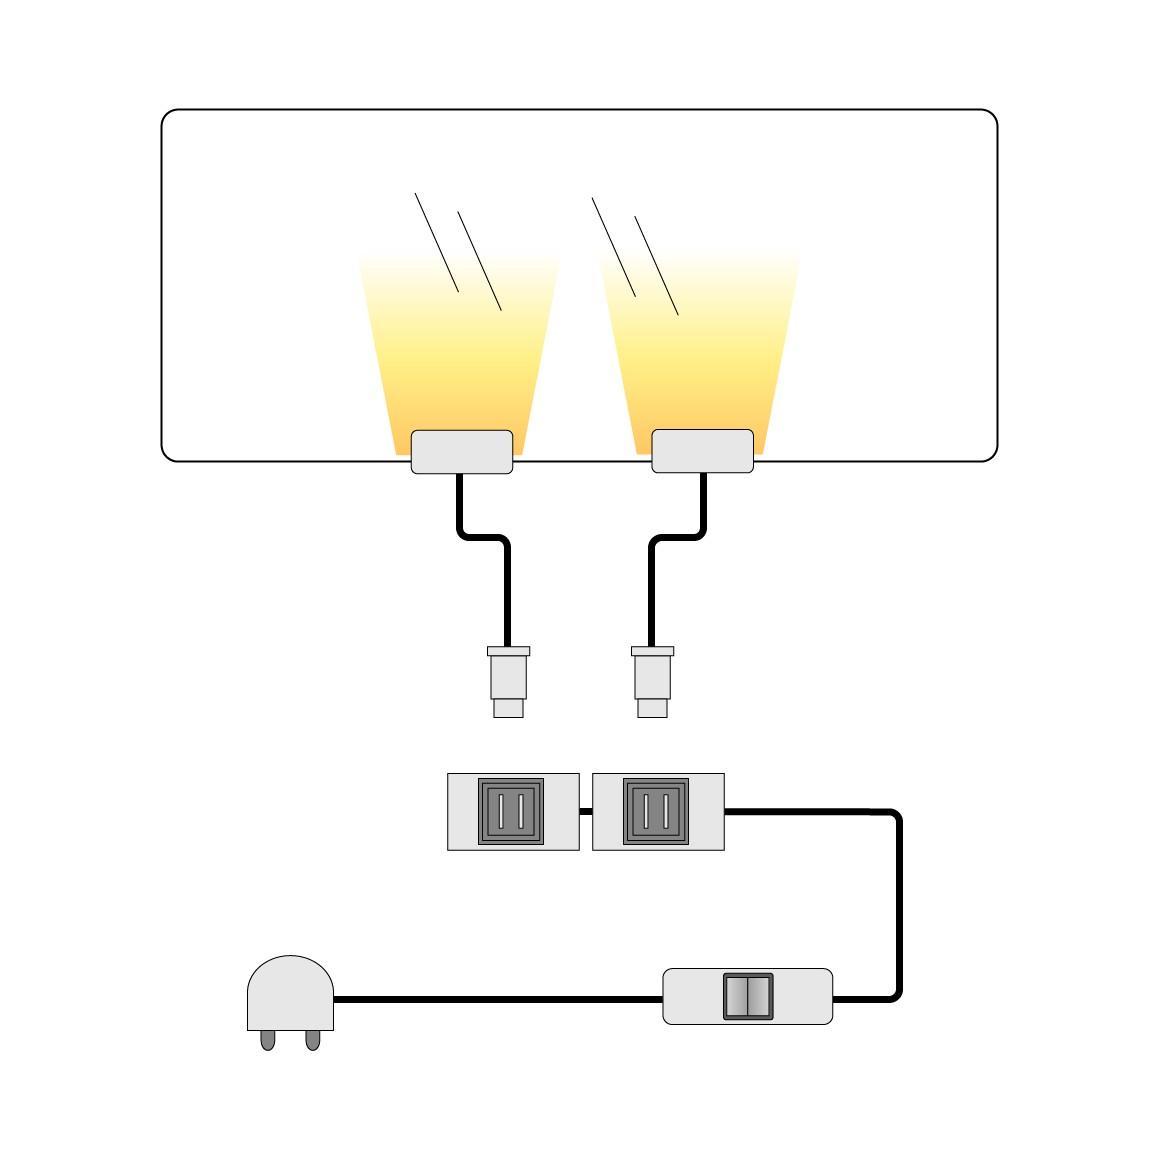 LED-Glaskantenbeleuchtung Structura